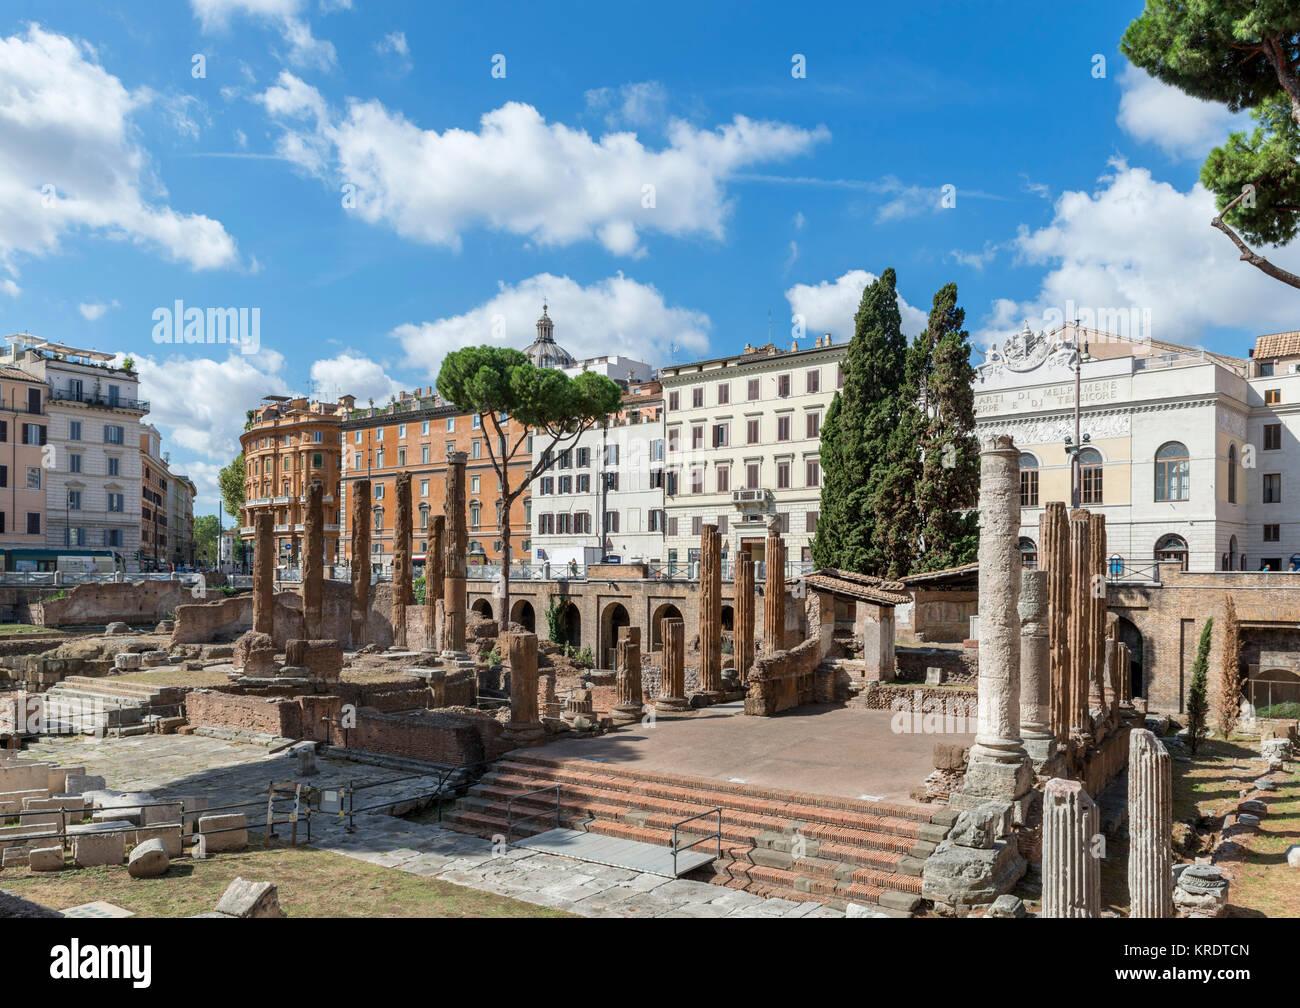 Largo di Torre Argentina in the historic centre, Rome, Italy - Stock Image